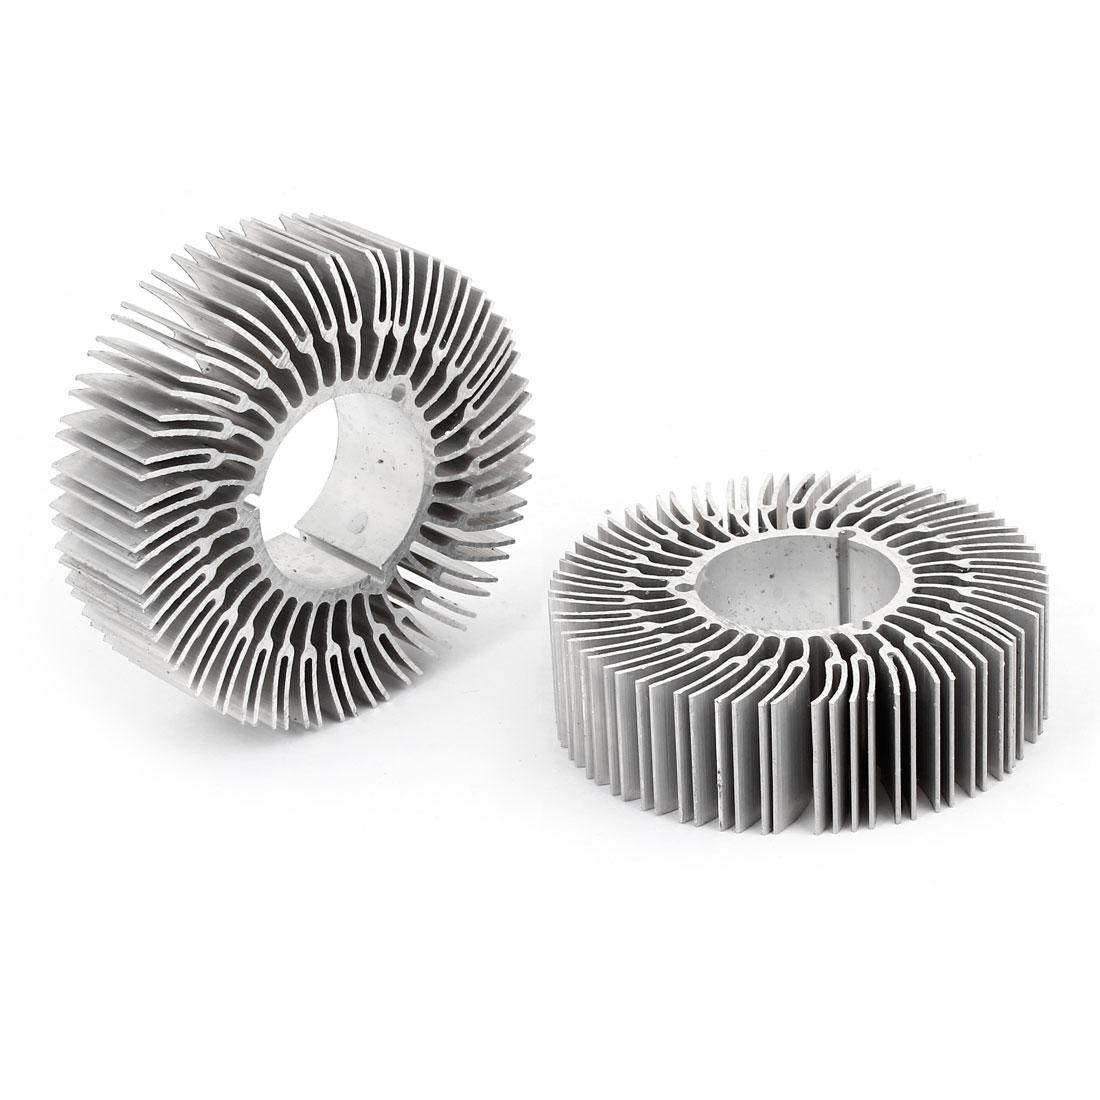 70mm x 28mm x 20mm Sivler Tone Aluminum Round Heatsink Cooling Fins 2 Pcs